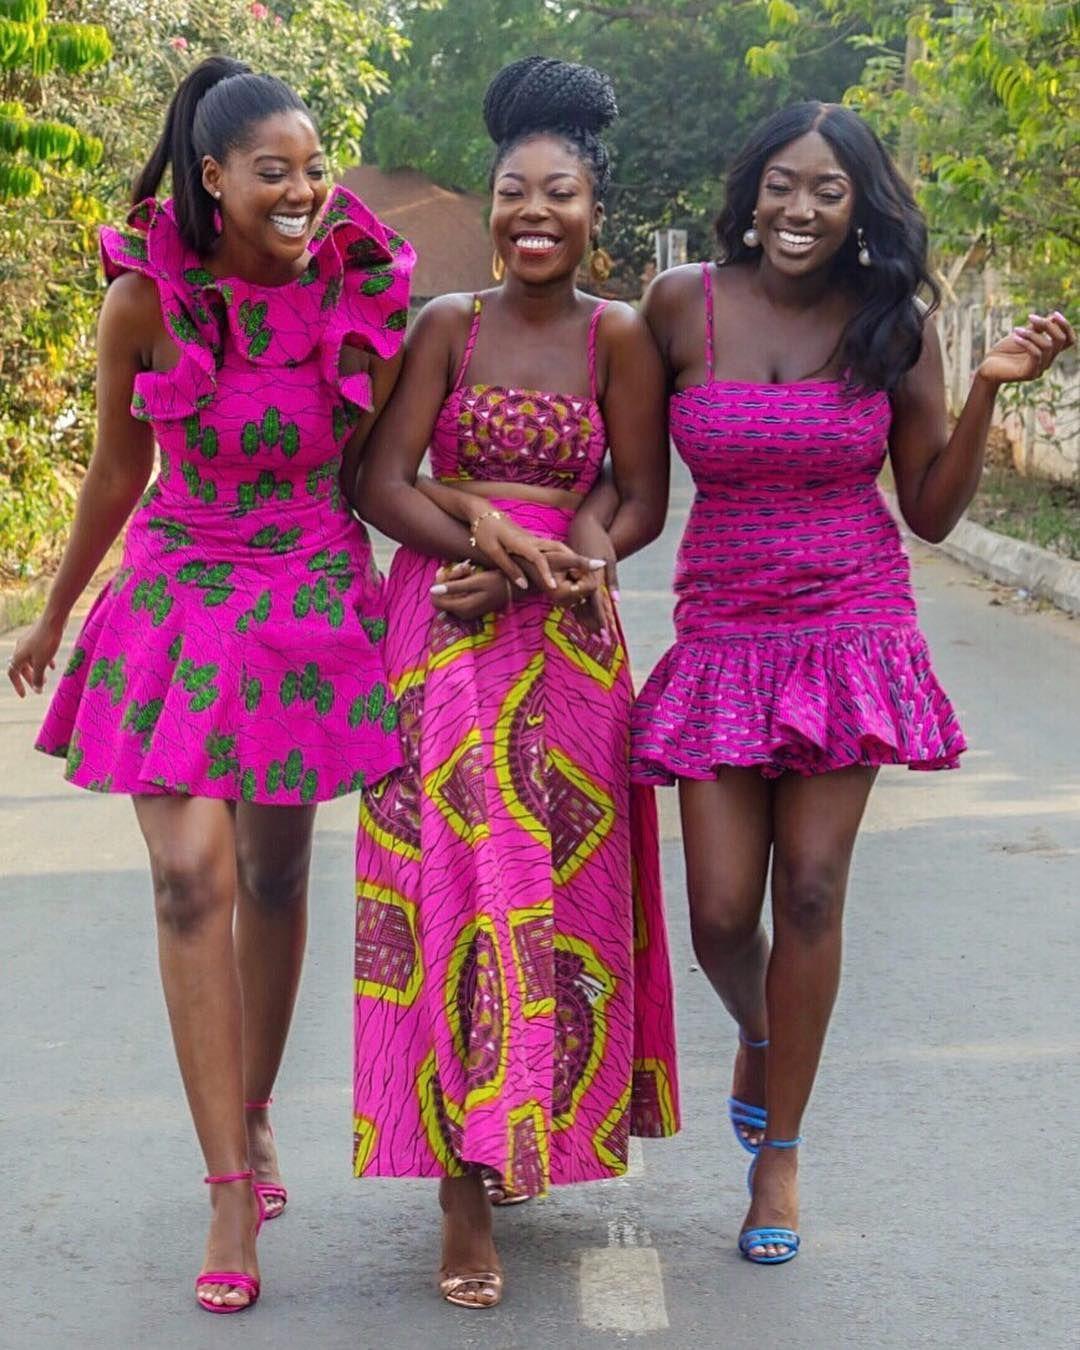 Pin de cynara mcintosh en African wear | Pinterest | Africanos, Moda ...